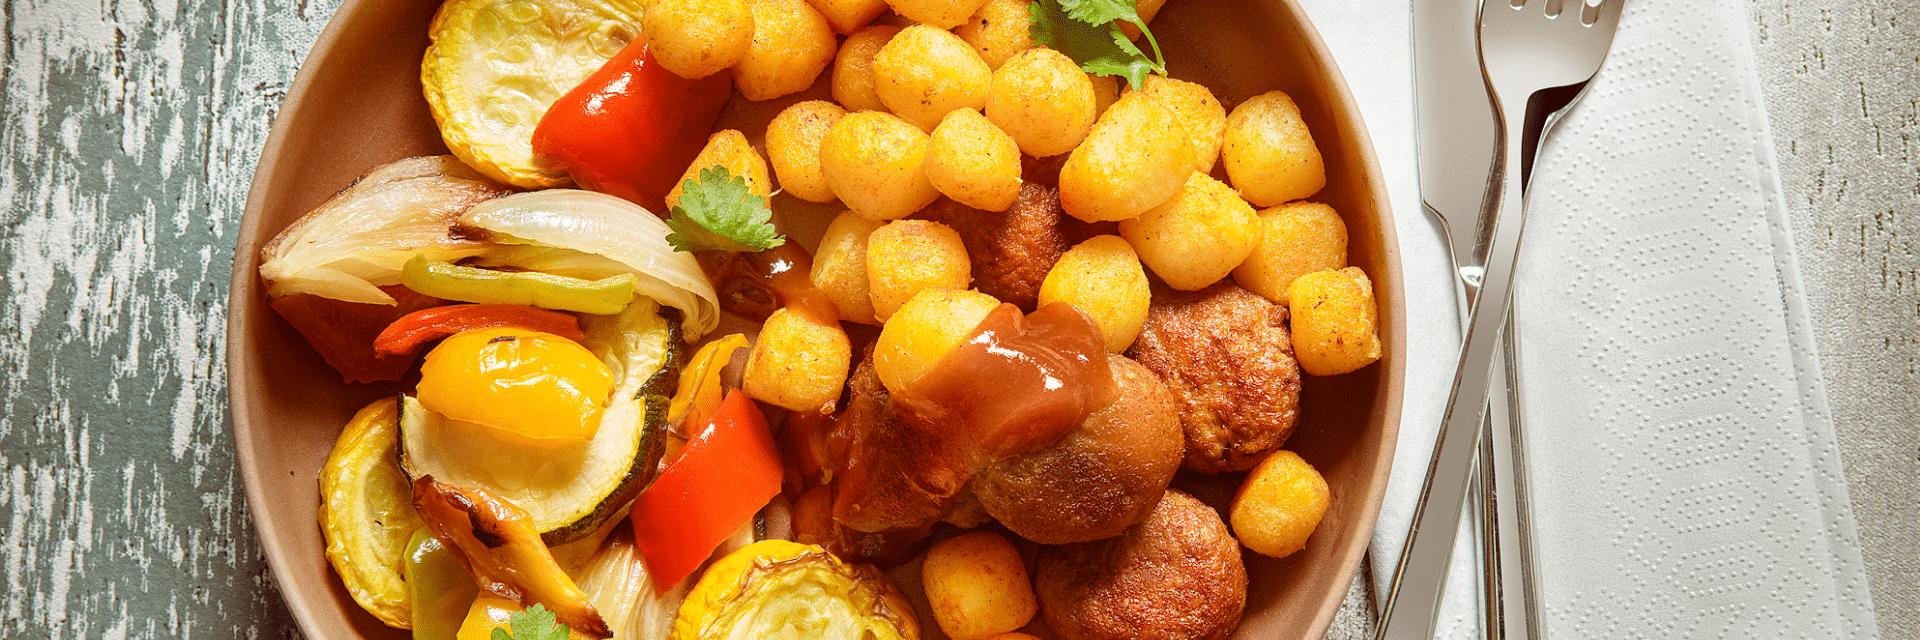 Mini Kriel met gerookte paprika en gegrilde groenten